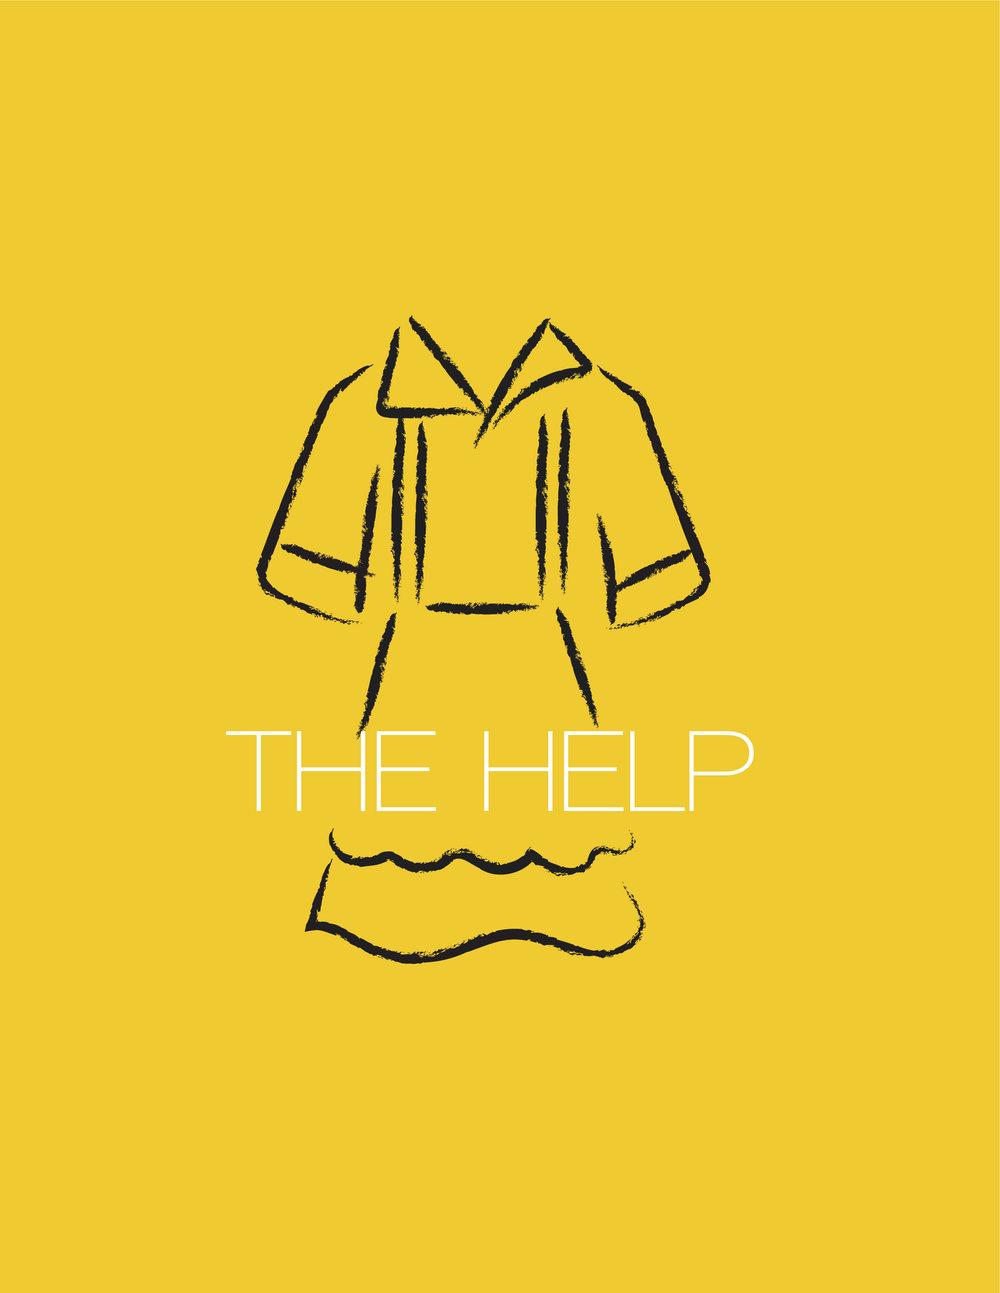 thehelp.jpg